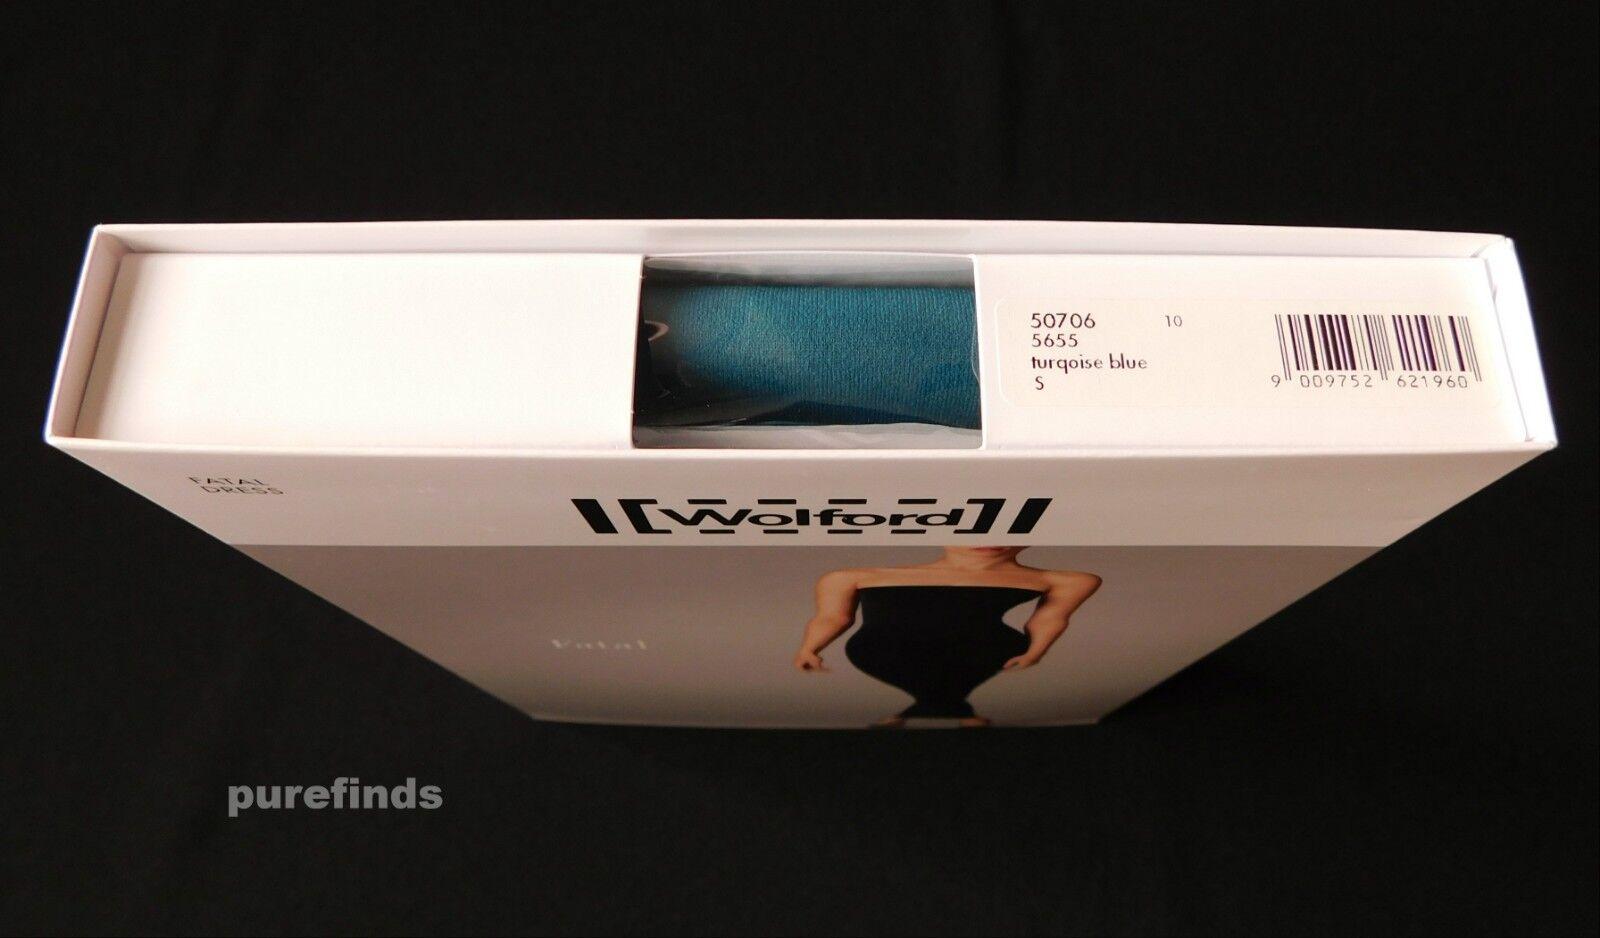 Abito WOLFORD FATALE 50706, Turqoise blu, taglia Small, USA USA USA 8 NUOVO IN SCATOLA dce642